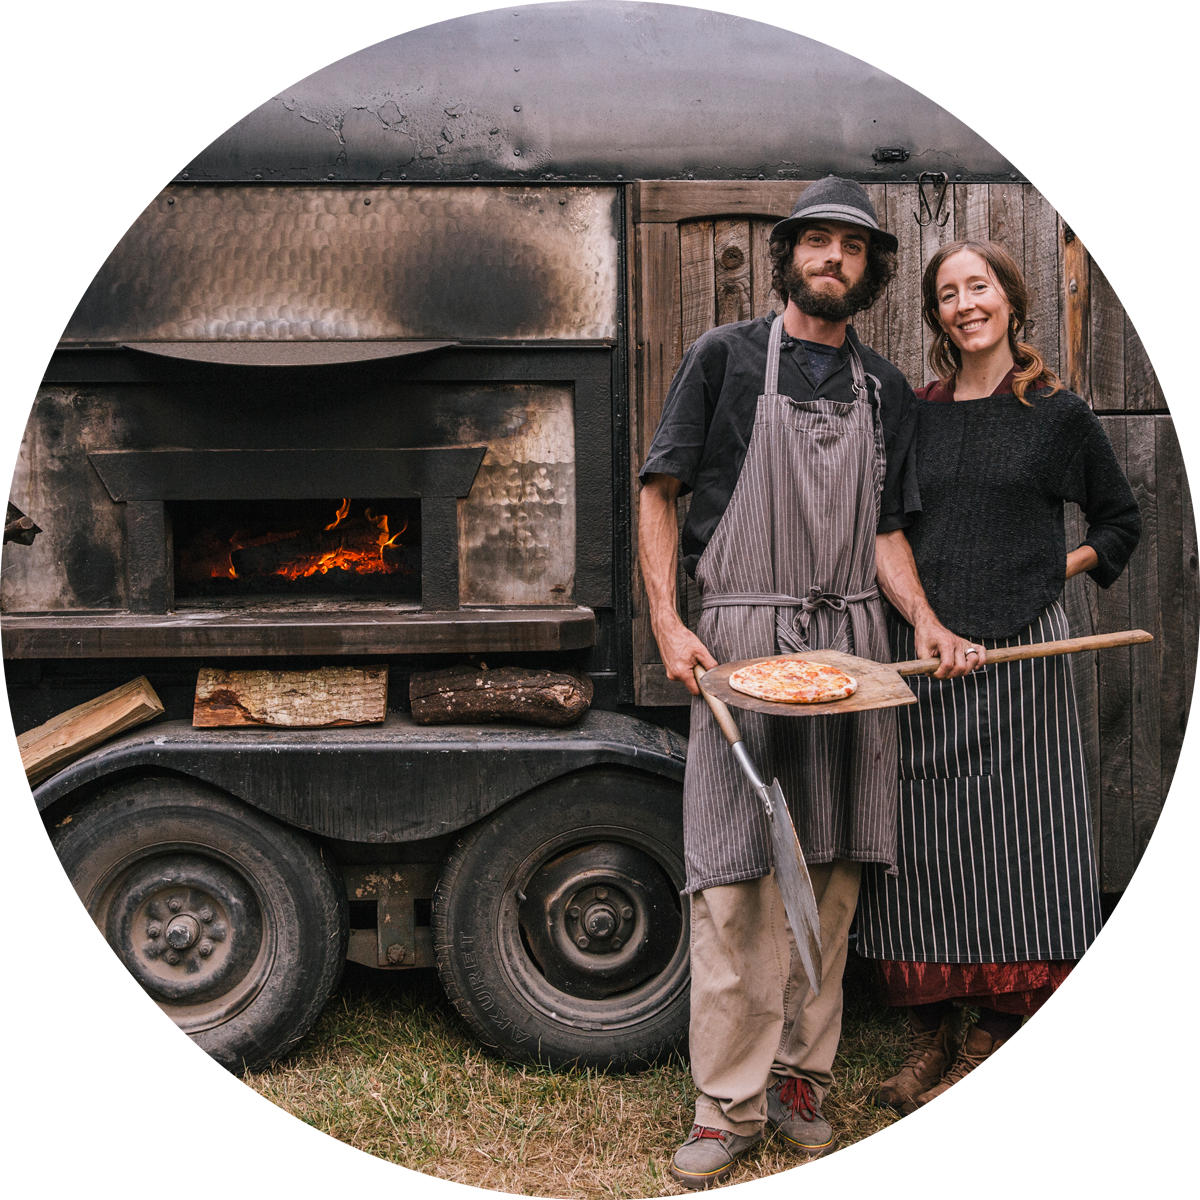 Soul Flour Bakery Owners, James Ferraris & Erica Ekrem; Photo by James Harnois.